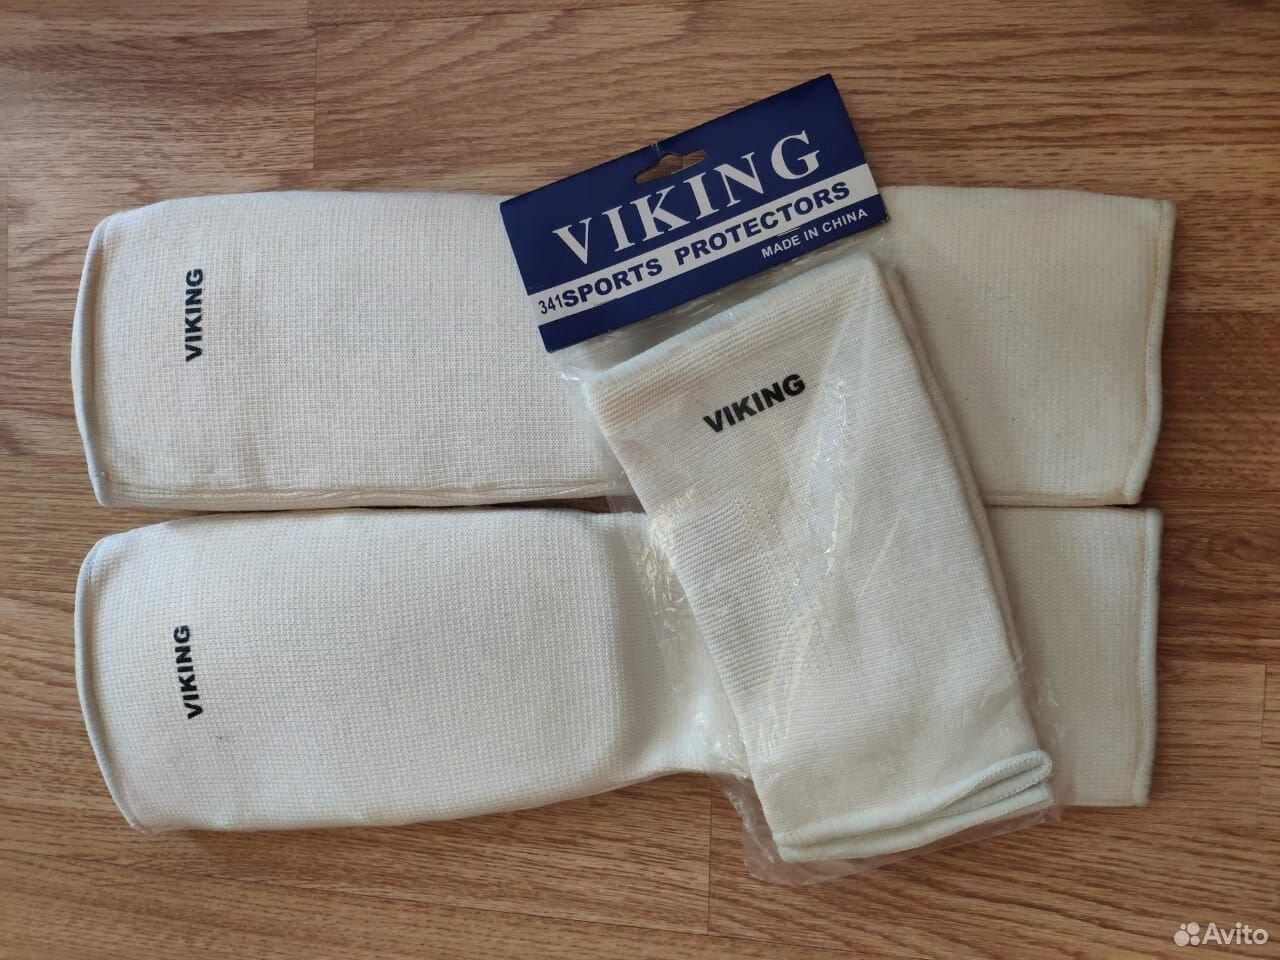 Защита для единоборств Viking